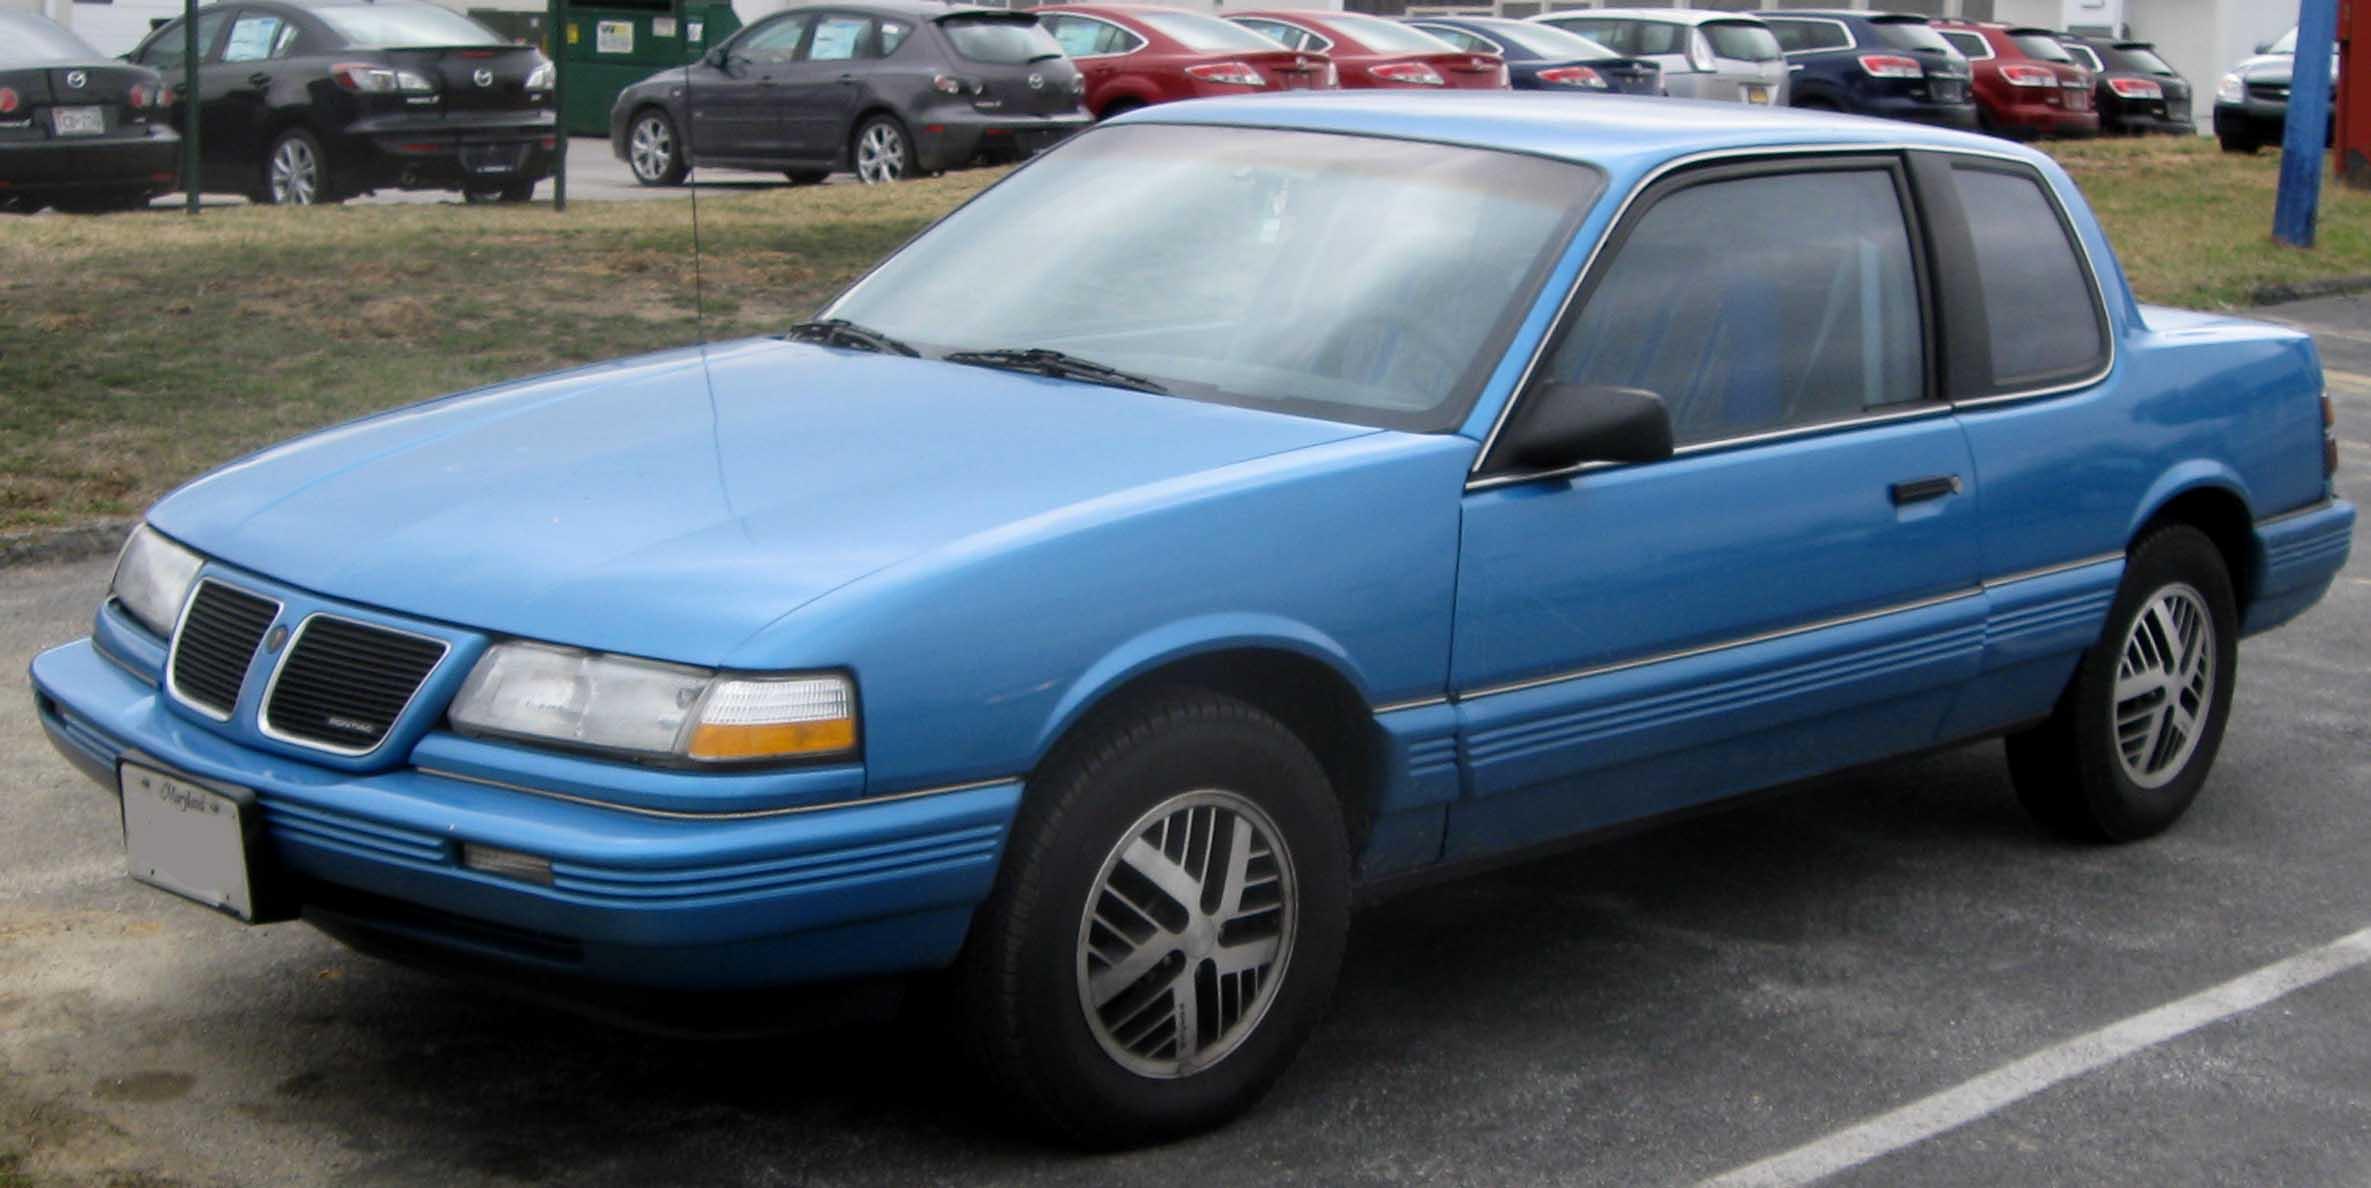 Pontiac Grand AM III 1984 - 1991 Coupe #7